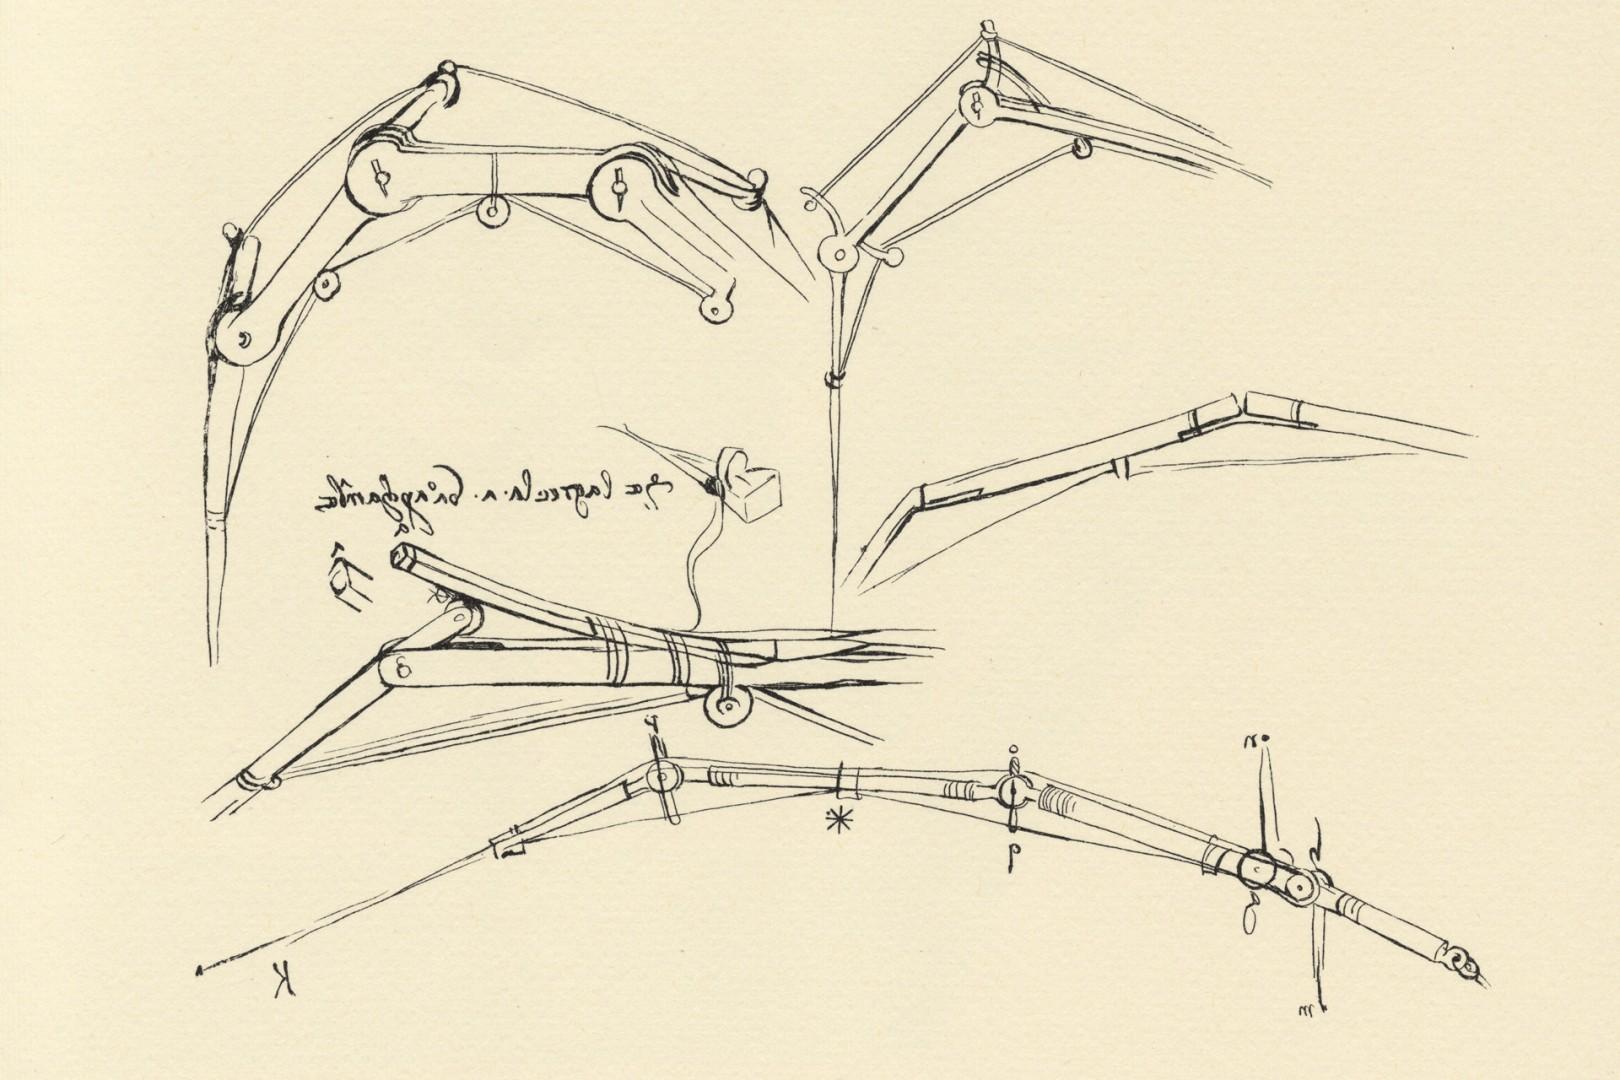 Leonardo da Vinci diagram of a proposed flying machine